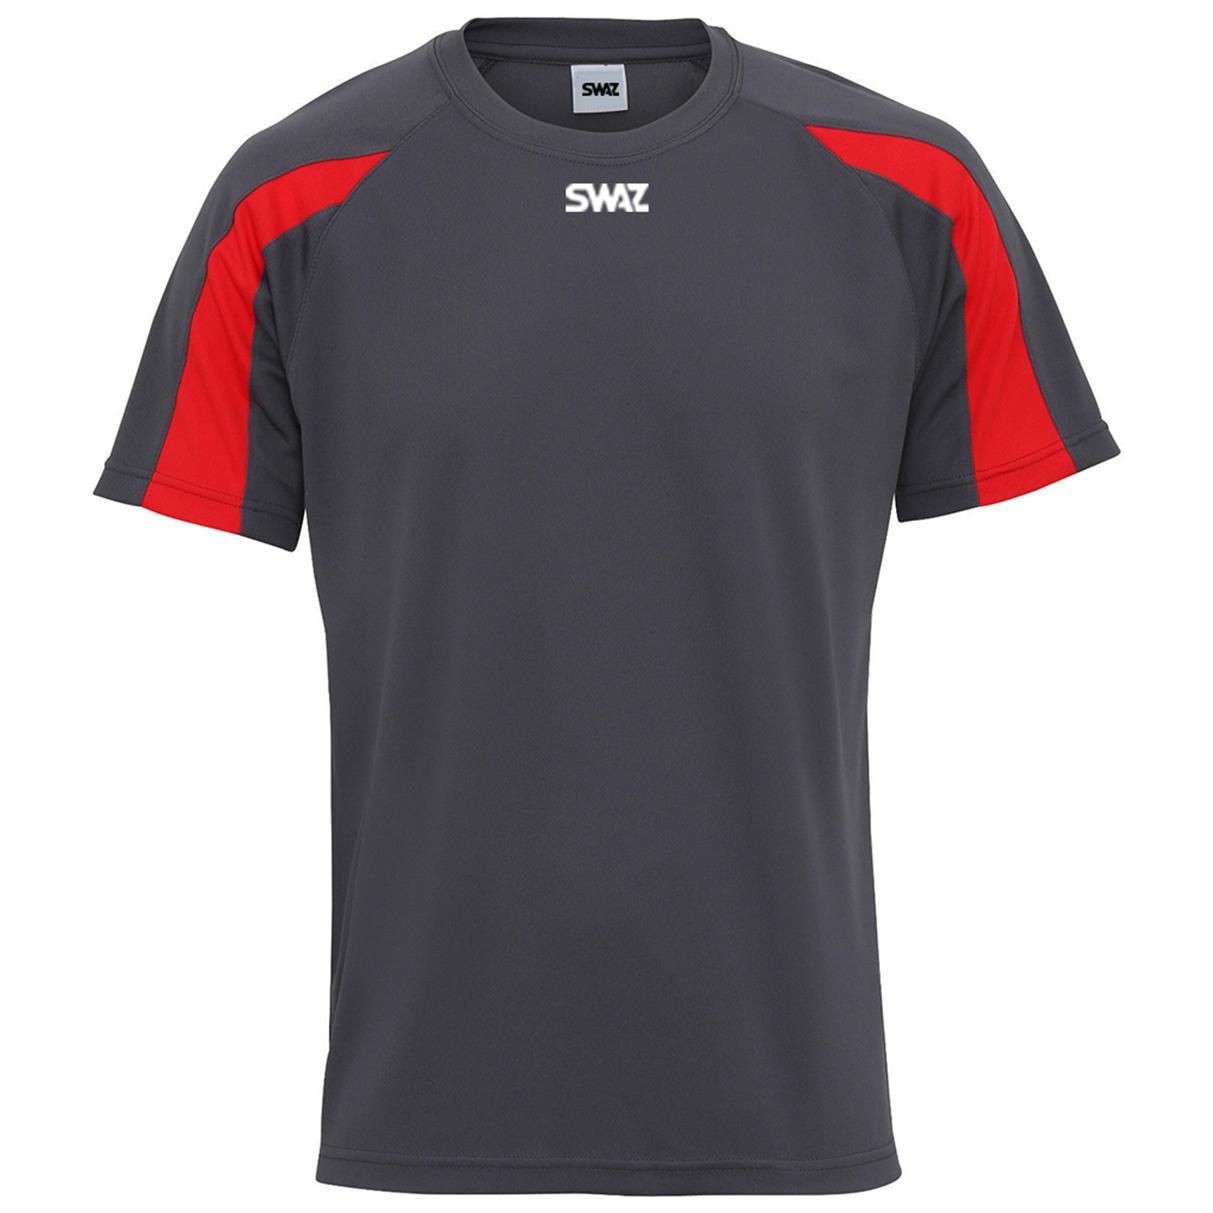 SWAZ Premier Training T-Shirt – Charcoal/Red